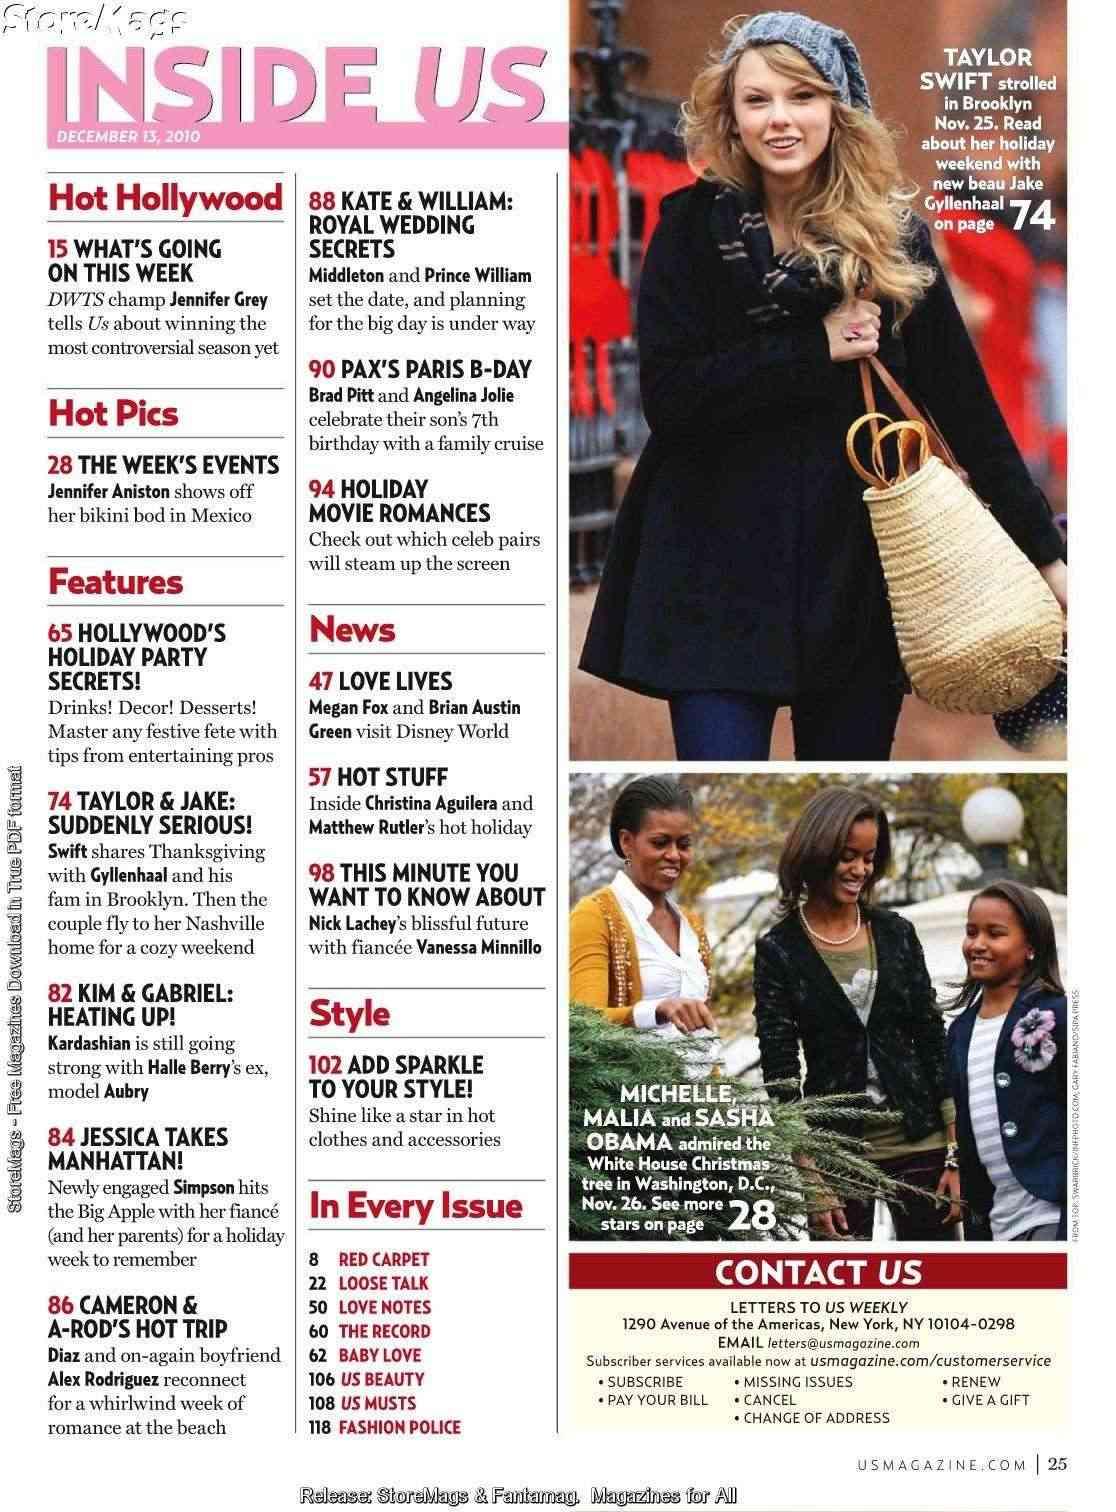 Taylor Swift - US Weekly - December 2010 Forum_78